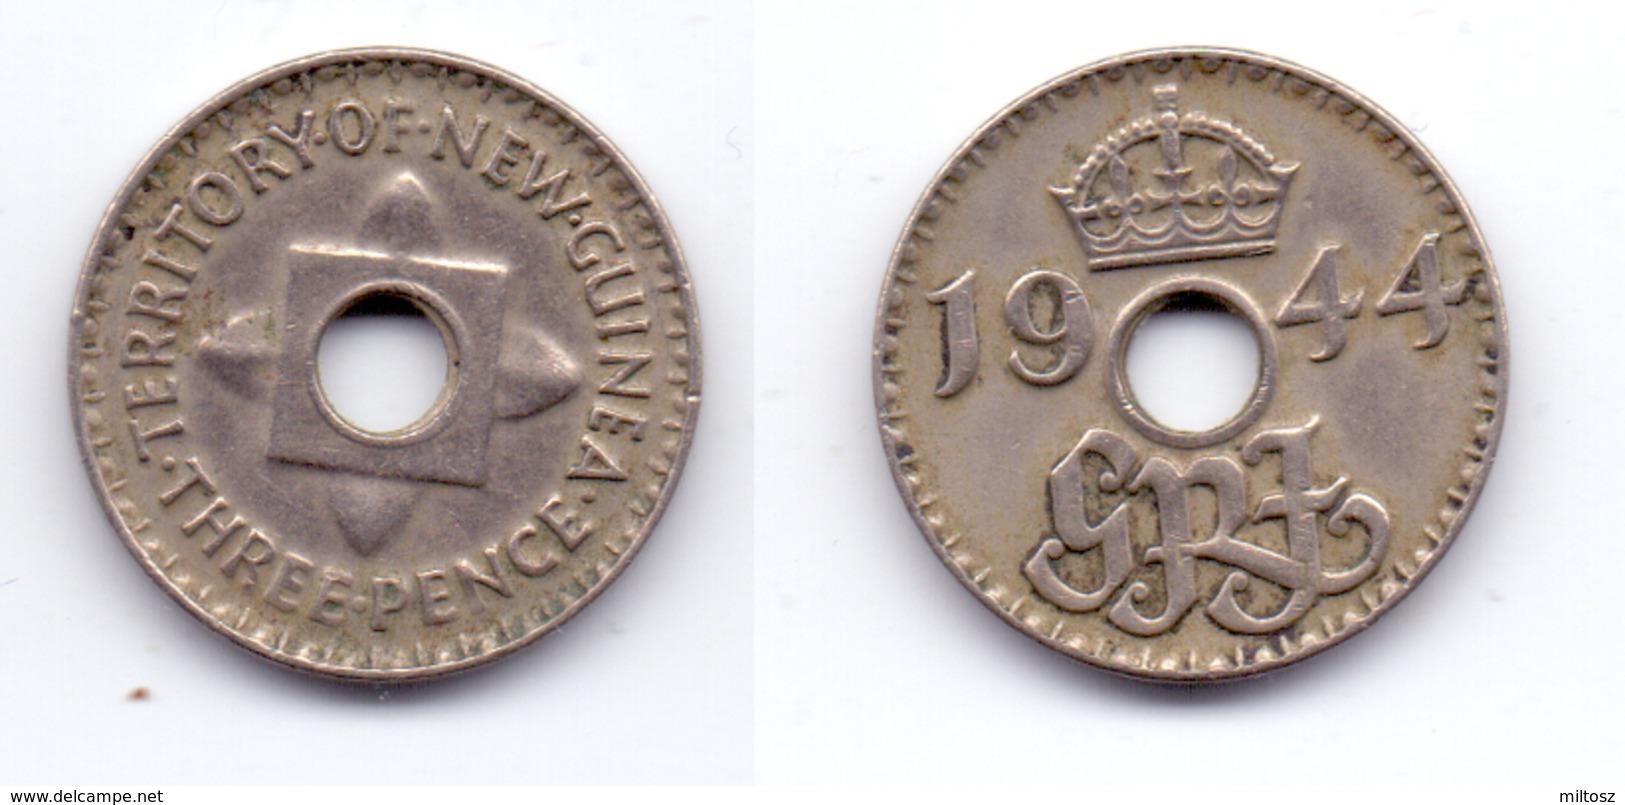 New Guinea 3 Pence 1944 - Papouasie-Nouvelle-Guinée